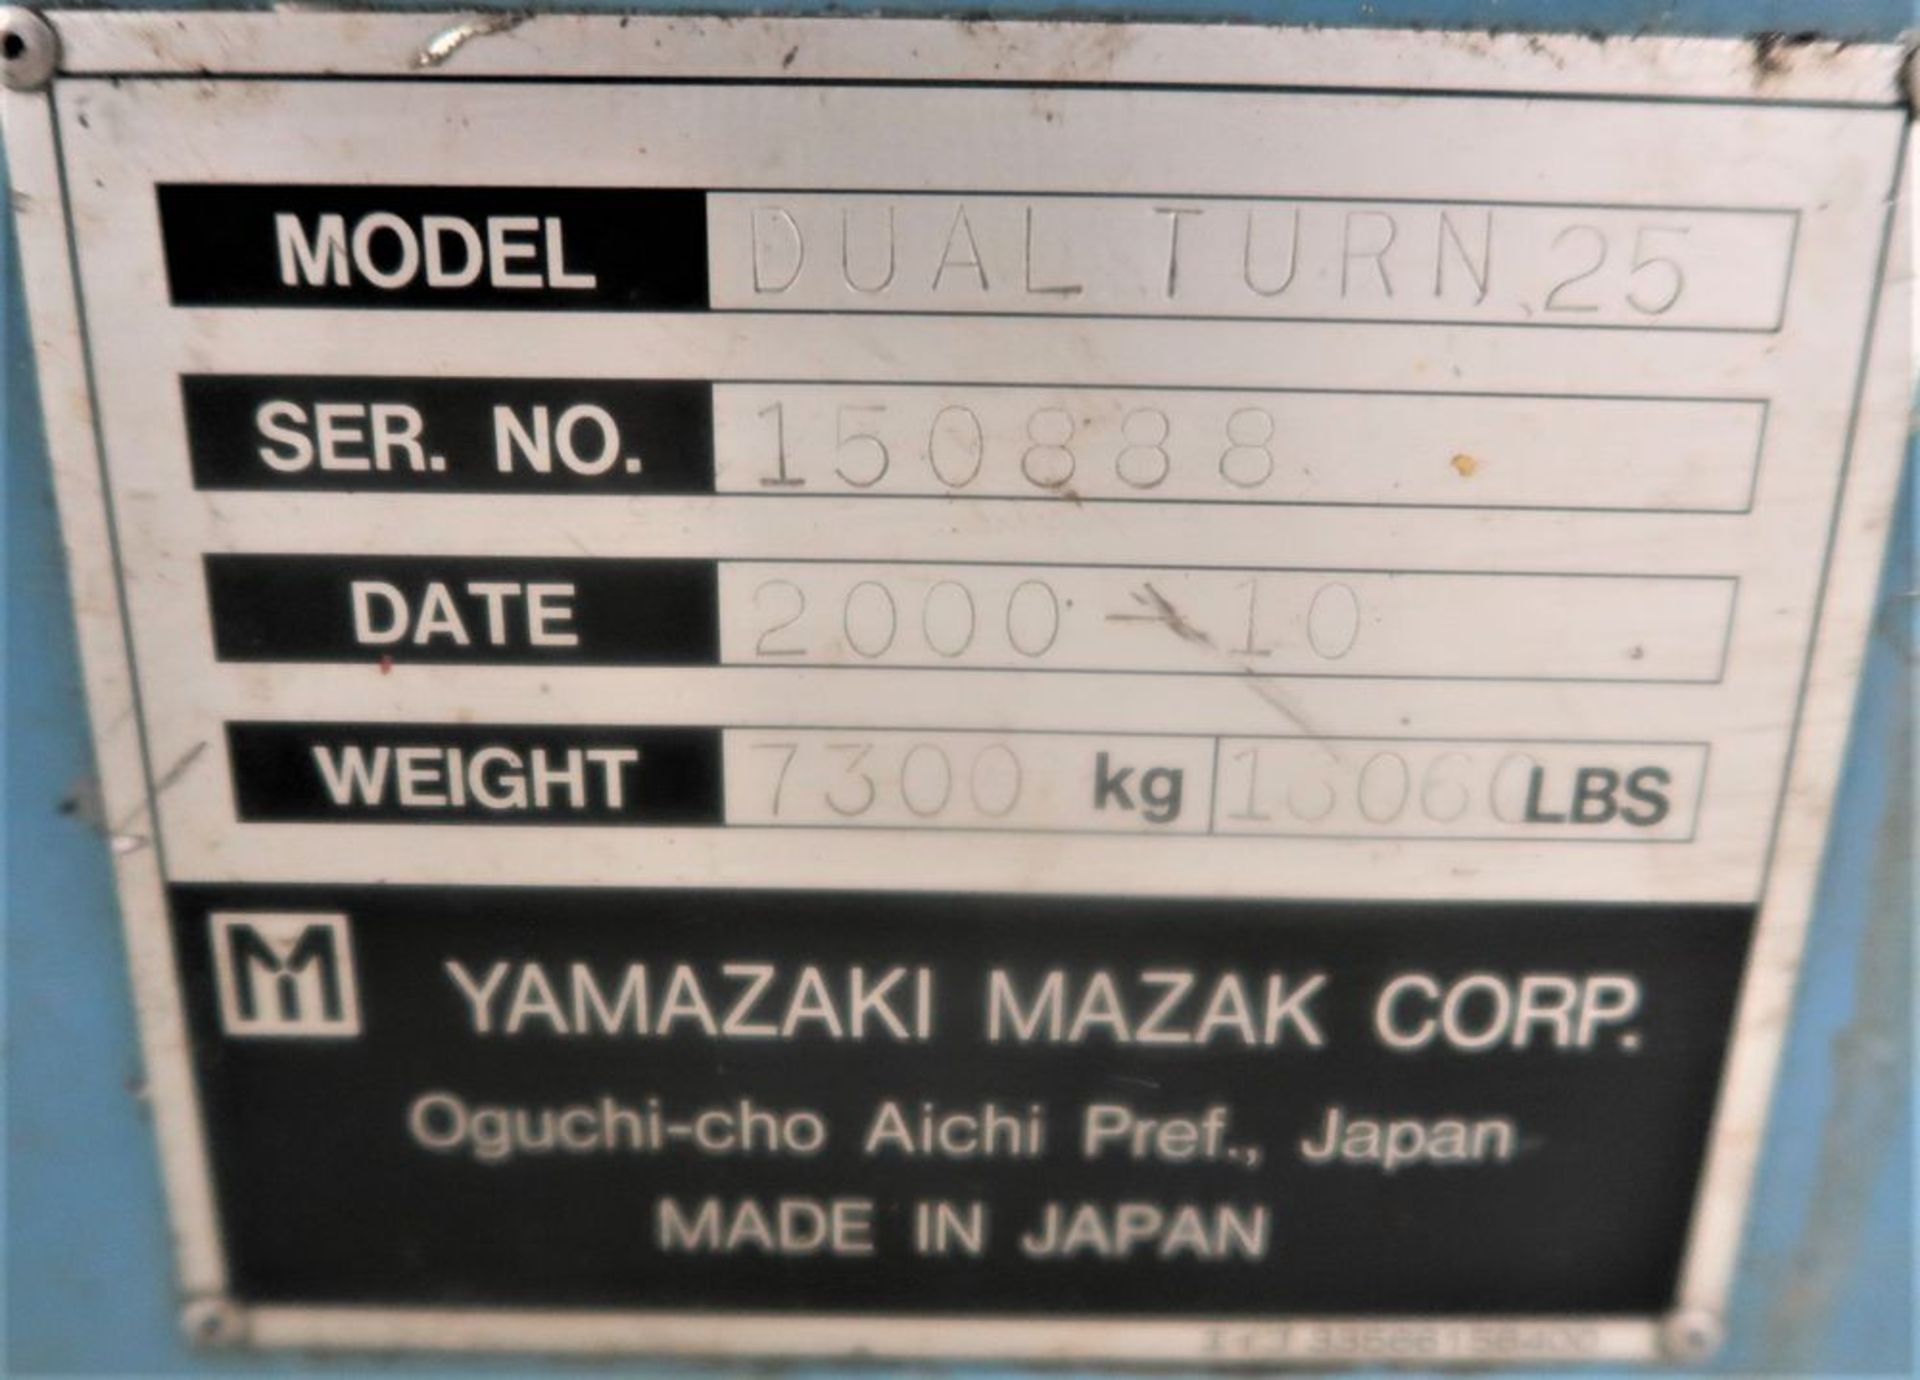 Mazak Dual Turn 25 Twin Spindle CNC Turning Center lathe, S/N 150888 - Image 10 of 13